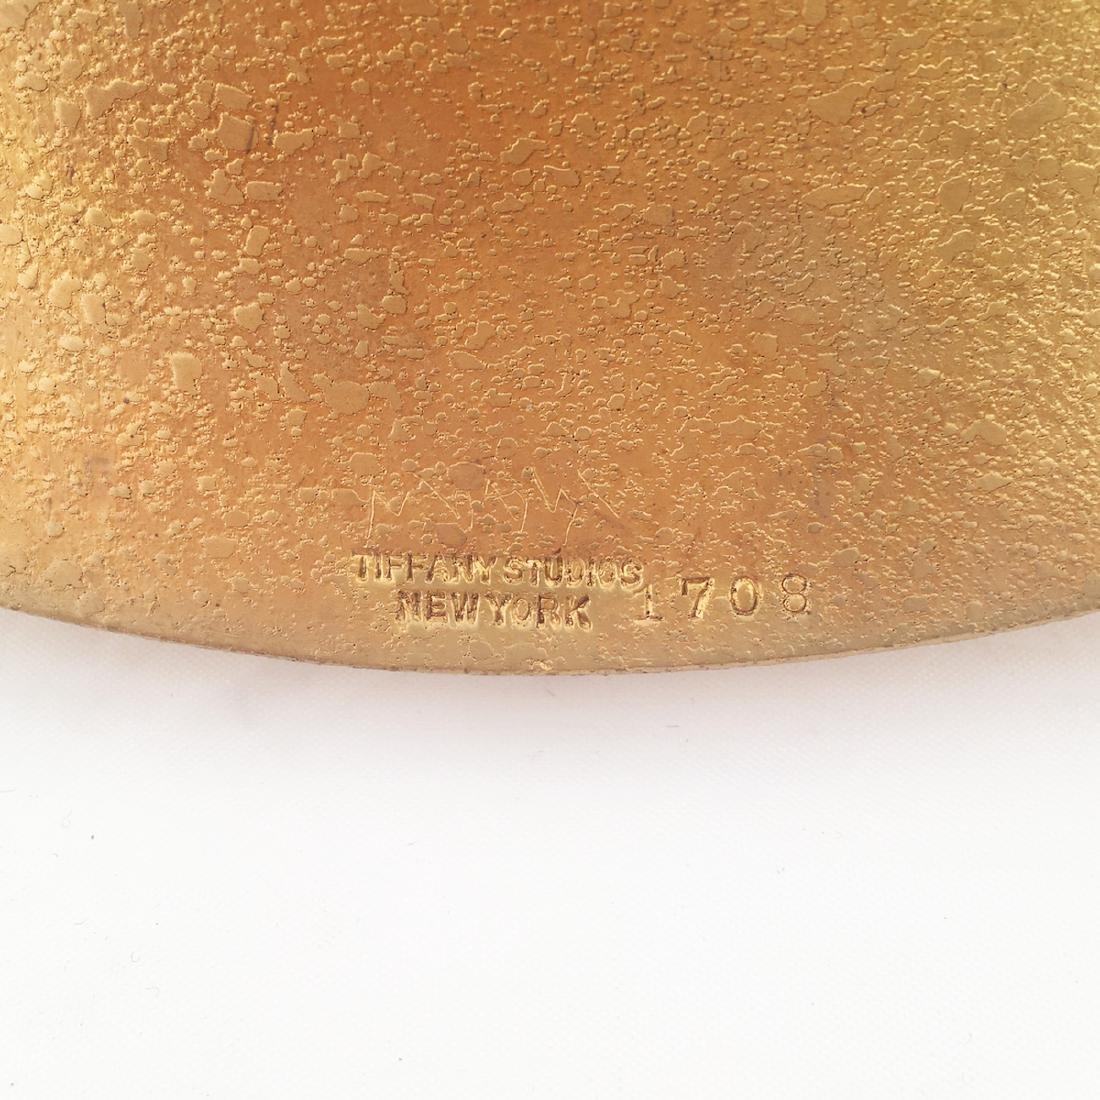 Tiffany Studios Gilt Bronze Utility Tray - 3